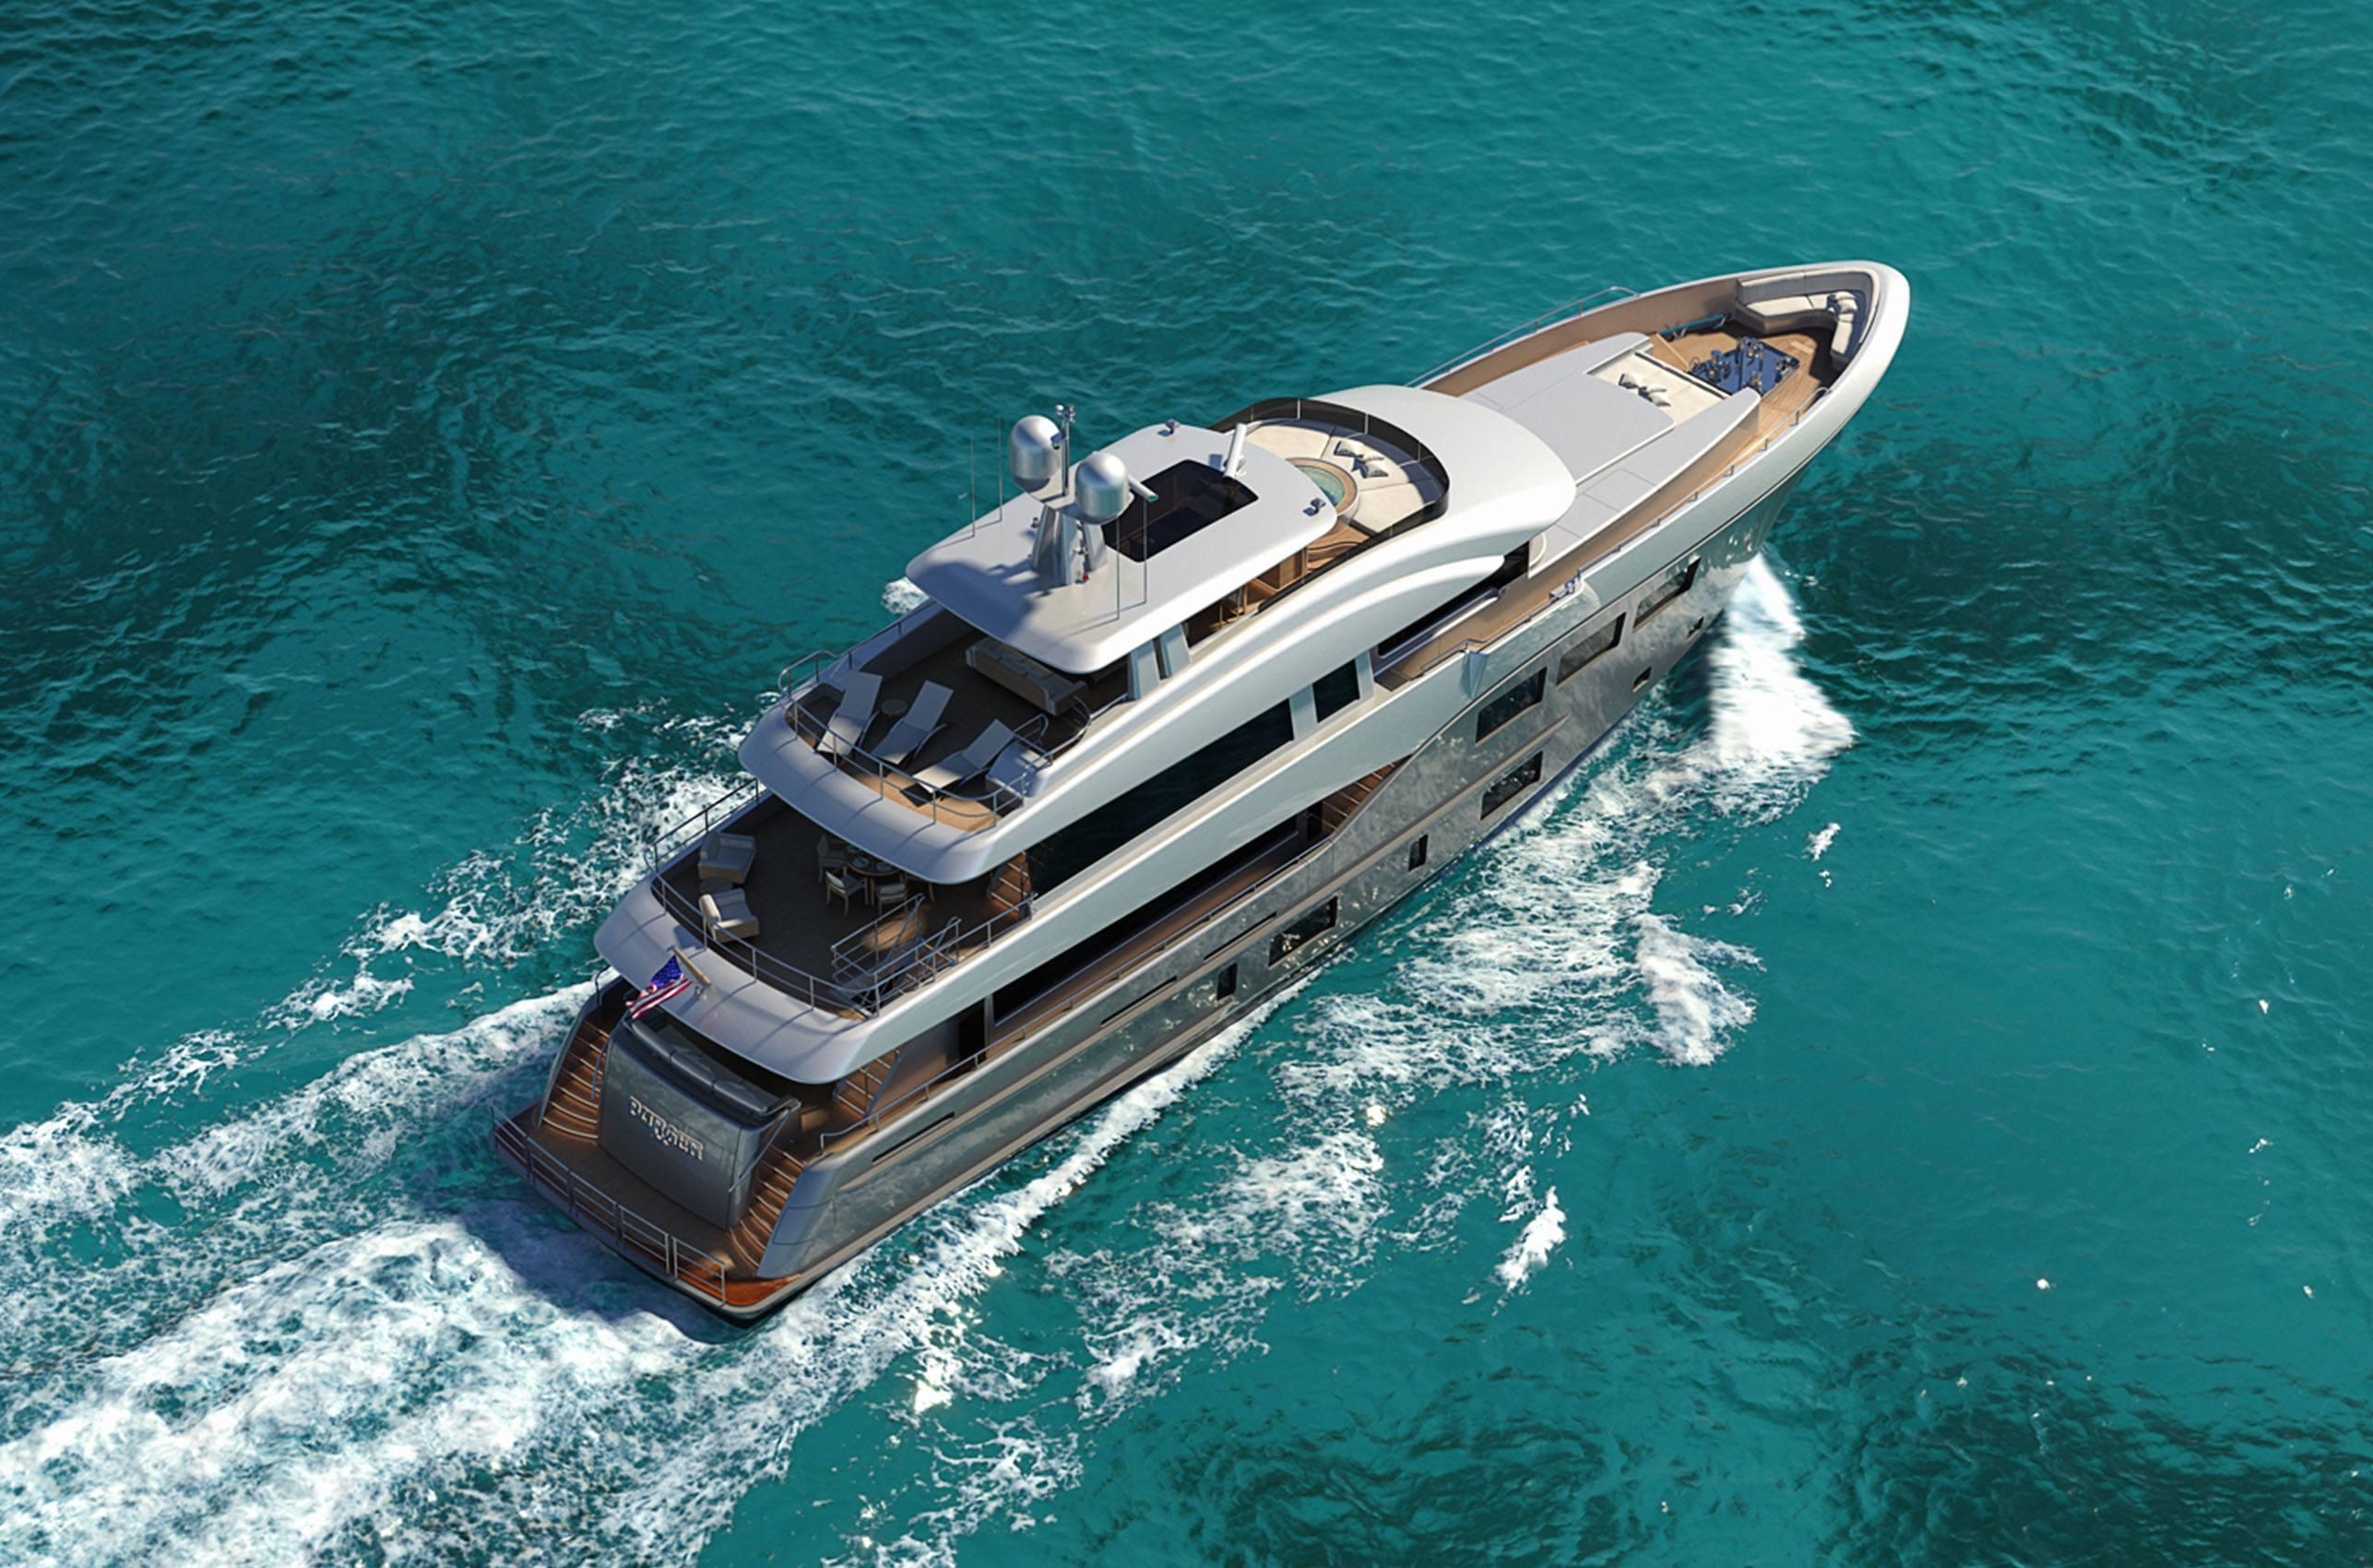 Alquiler de yates de lujo Burger Yachts